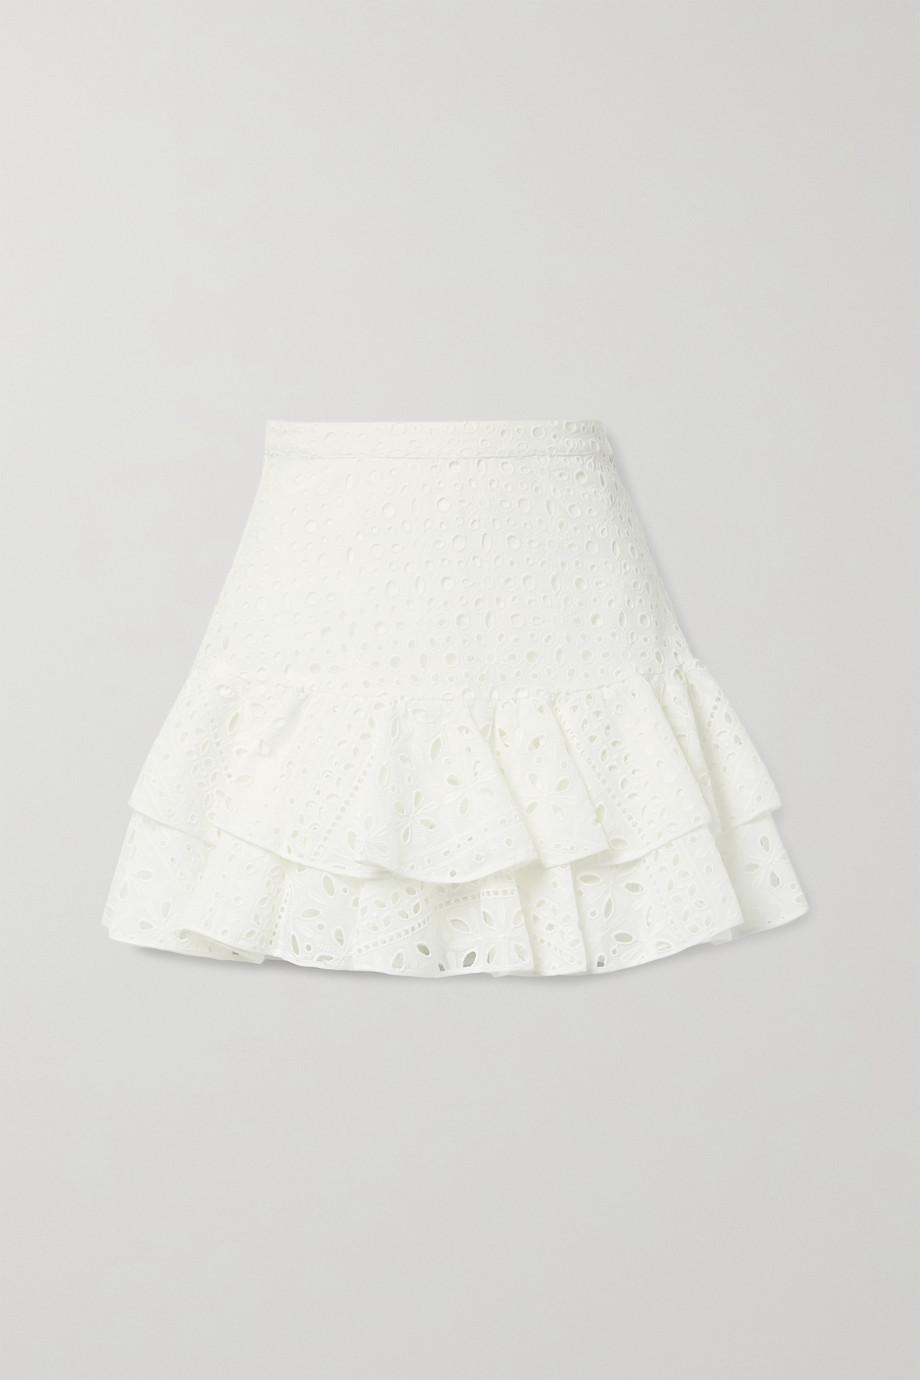 Charo Ruiz Natalie ruffled broderie anglaise cotton-blend mini skirt